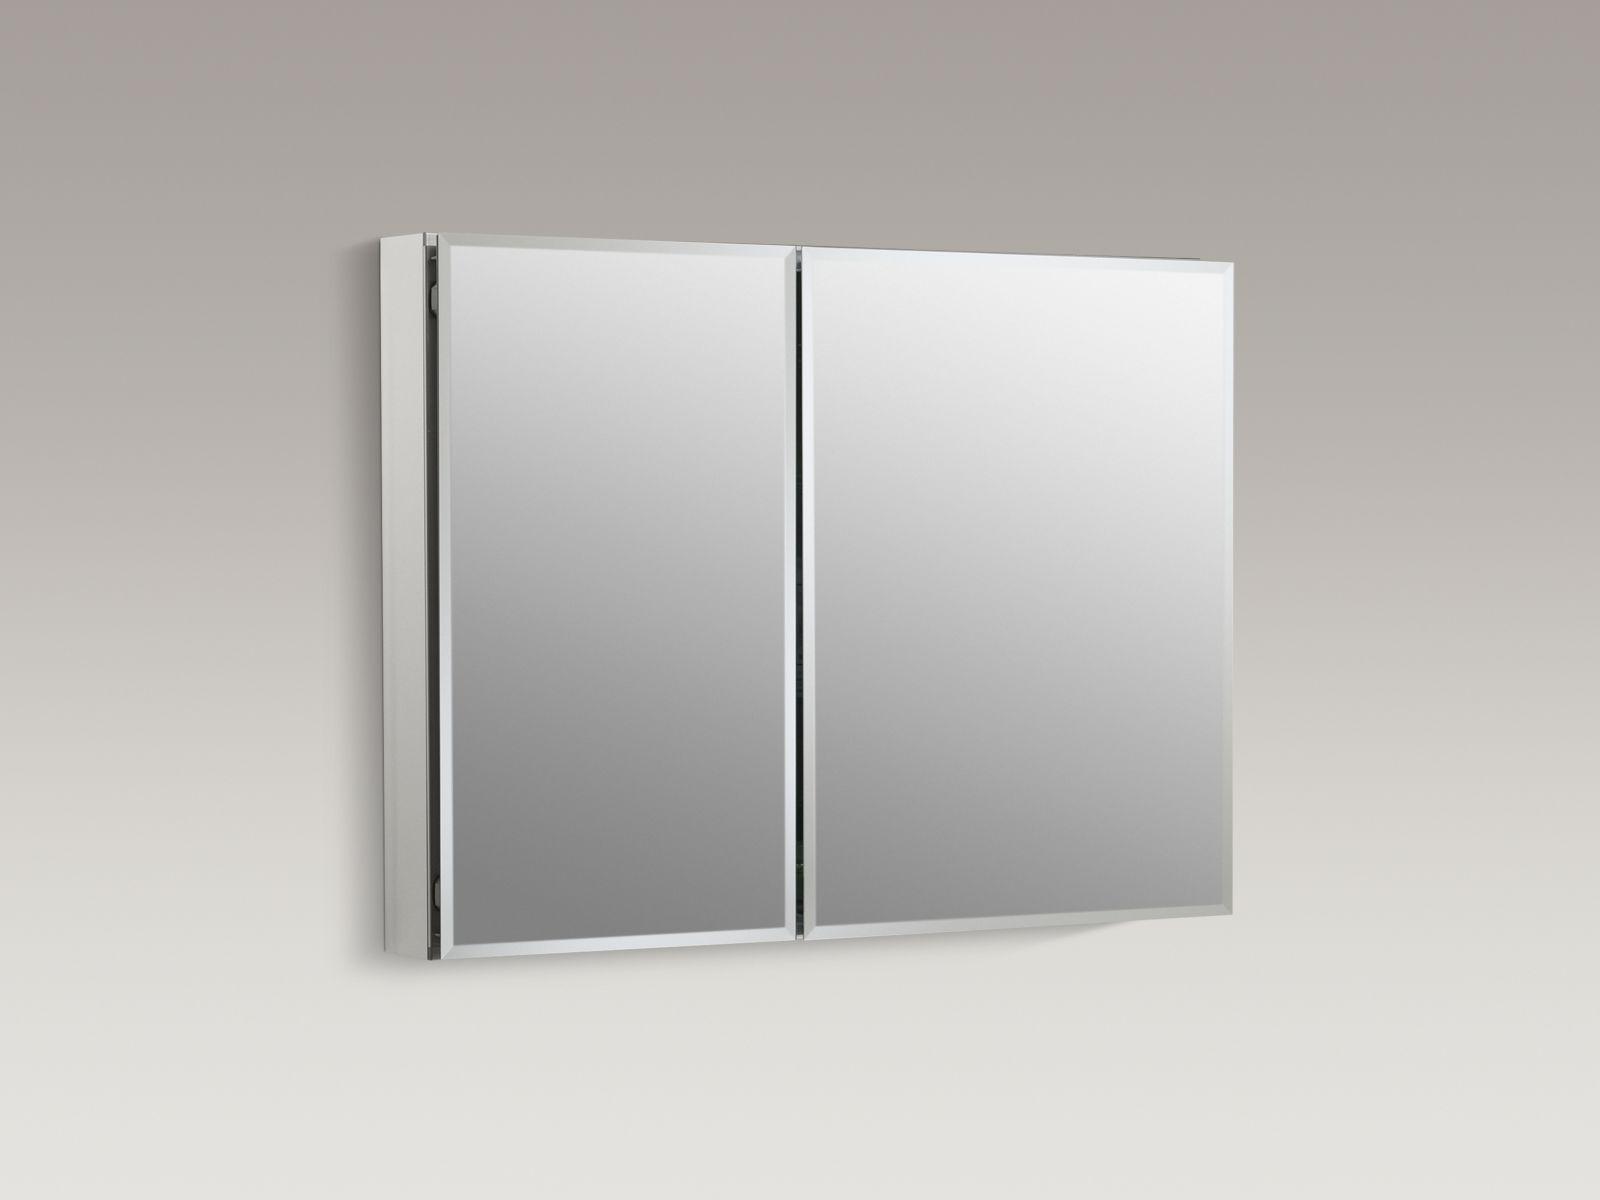 "Kohler K-CB-CLC3526FS Aluminum 35"" x 26"" Two-door Medicine Cabinet with Square Mirrored Doors"